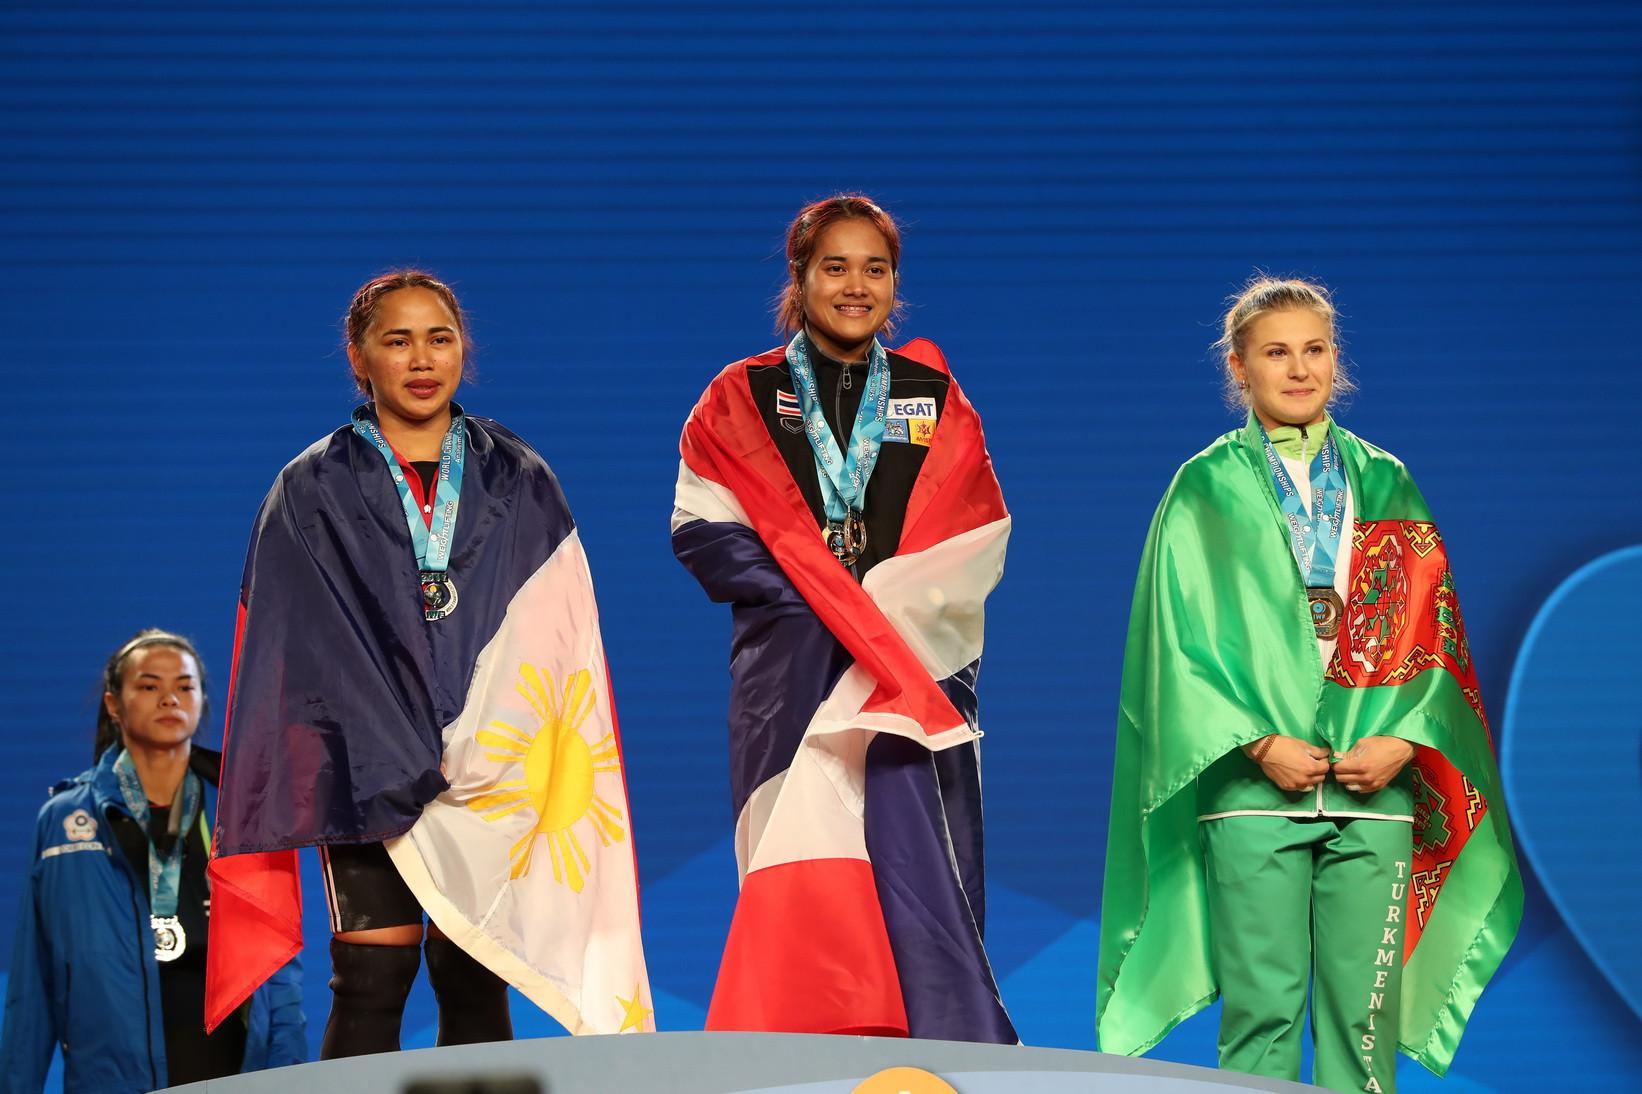 Tanasan tops women's 53kg podium at 2017 IWF World Championships as defending champion suffers injury